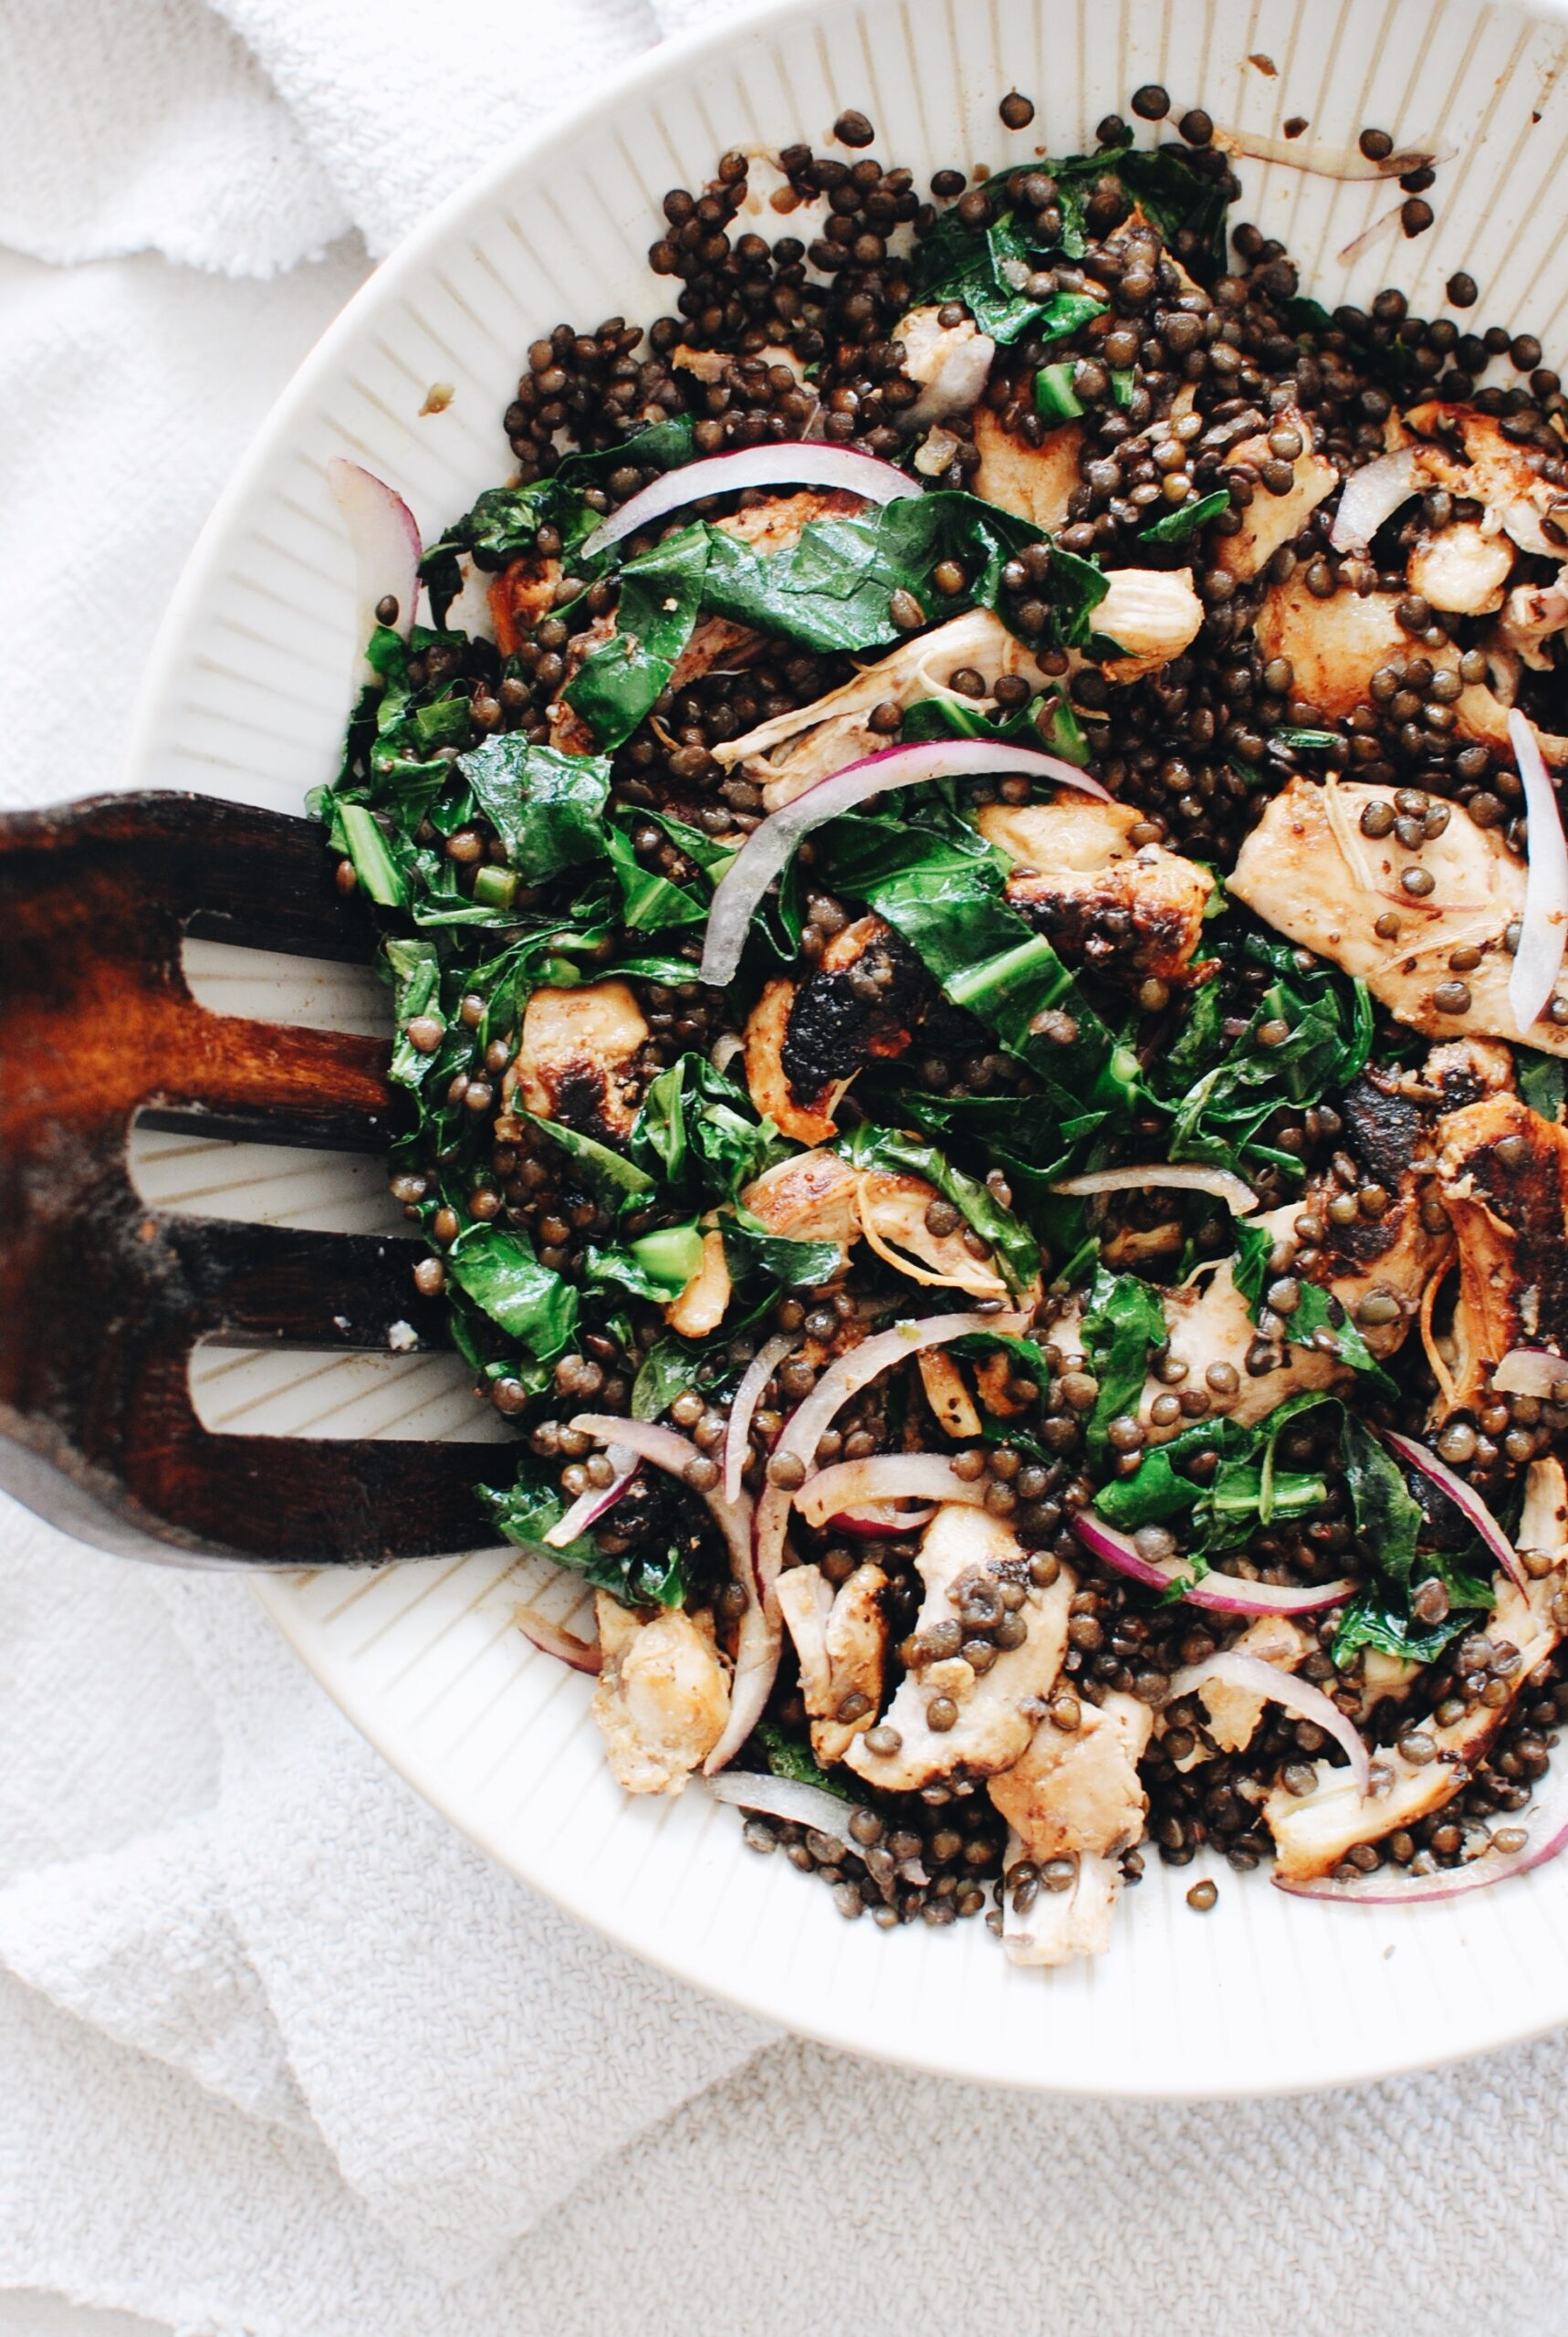 Buttermilk Chicken with Lentils and Collard Greens / Bev Cooks